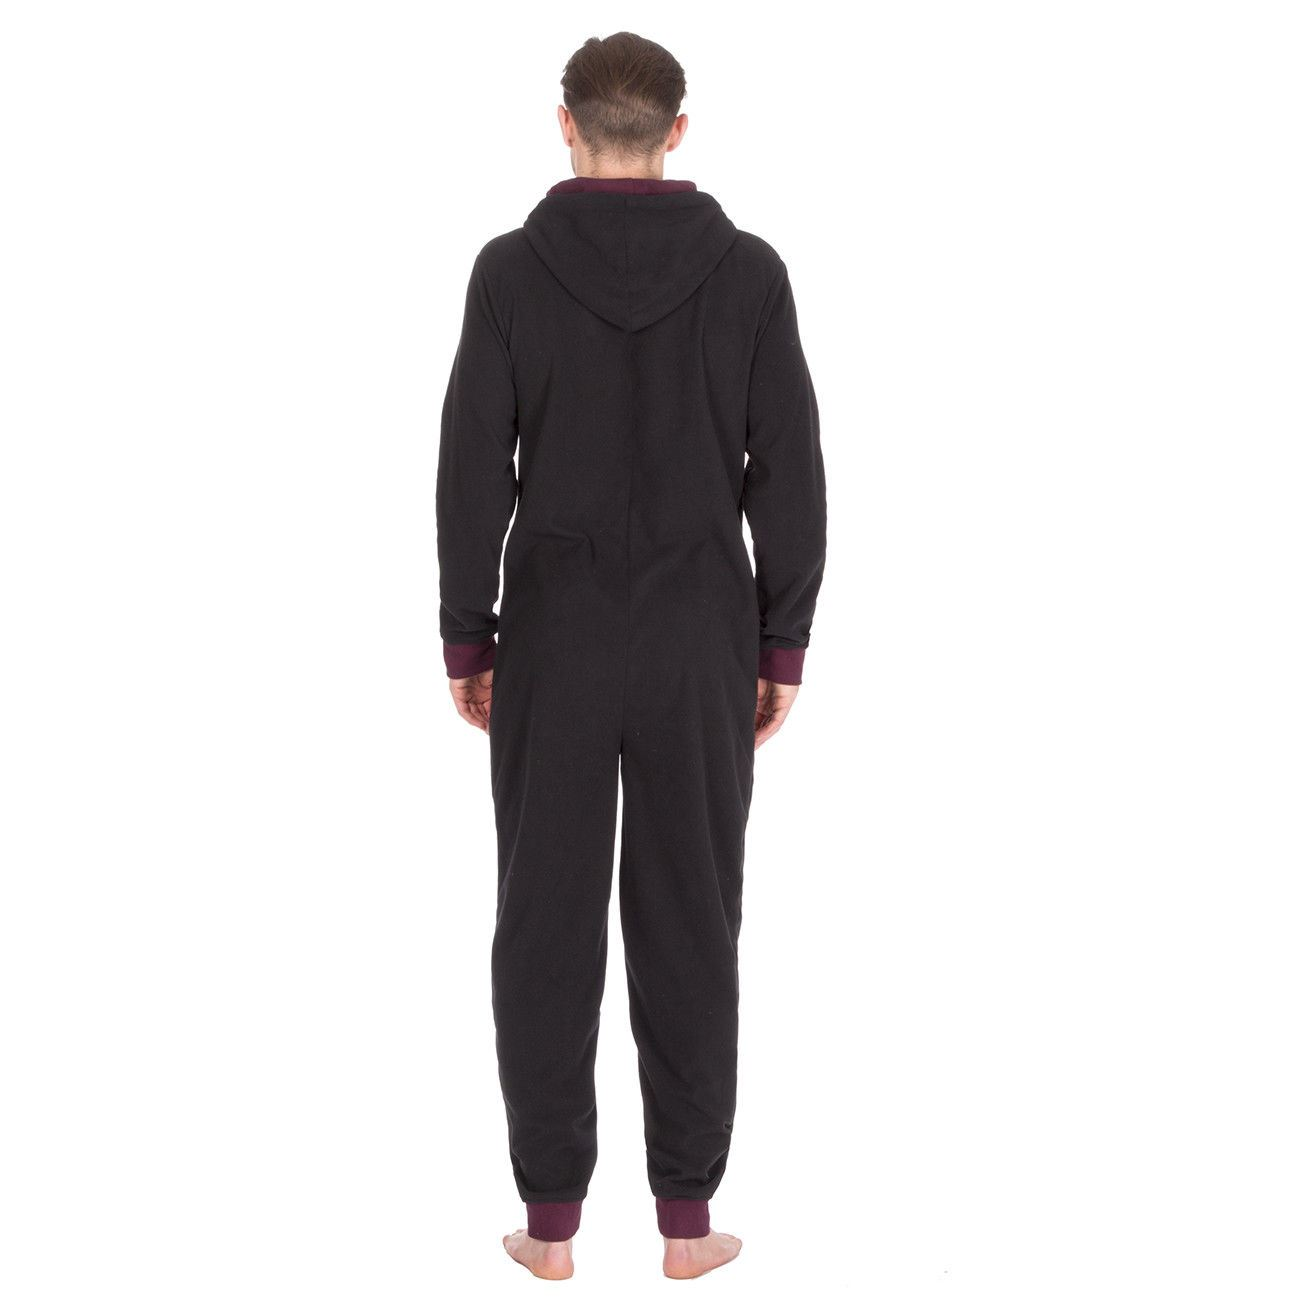 Mens//Boys All In One Fleece Jumpsuit Pyjamas Hood Size Small Medium Large XL